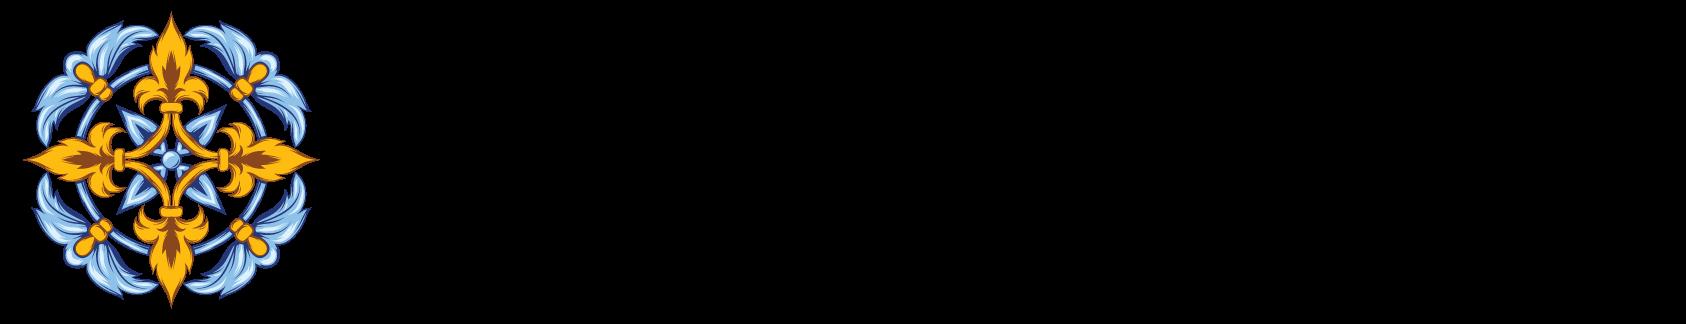 Casa-de-Ramana-Final-Logo.png